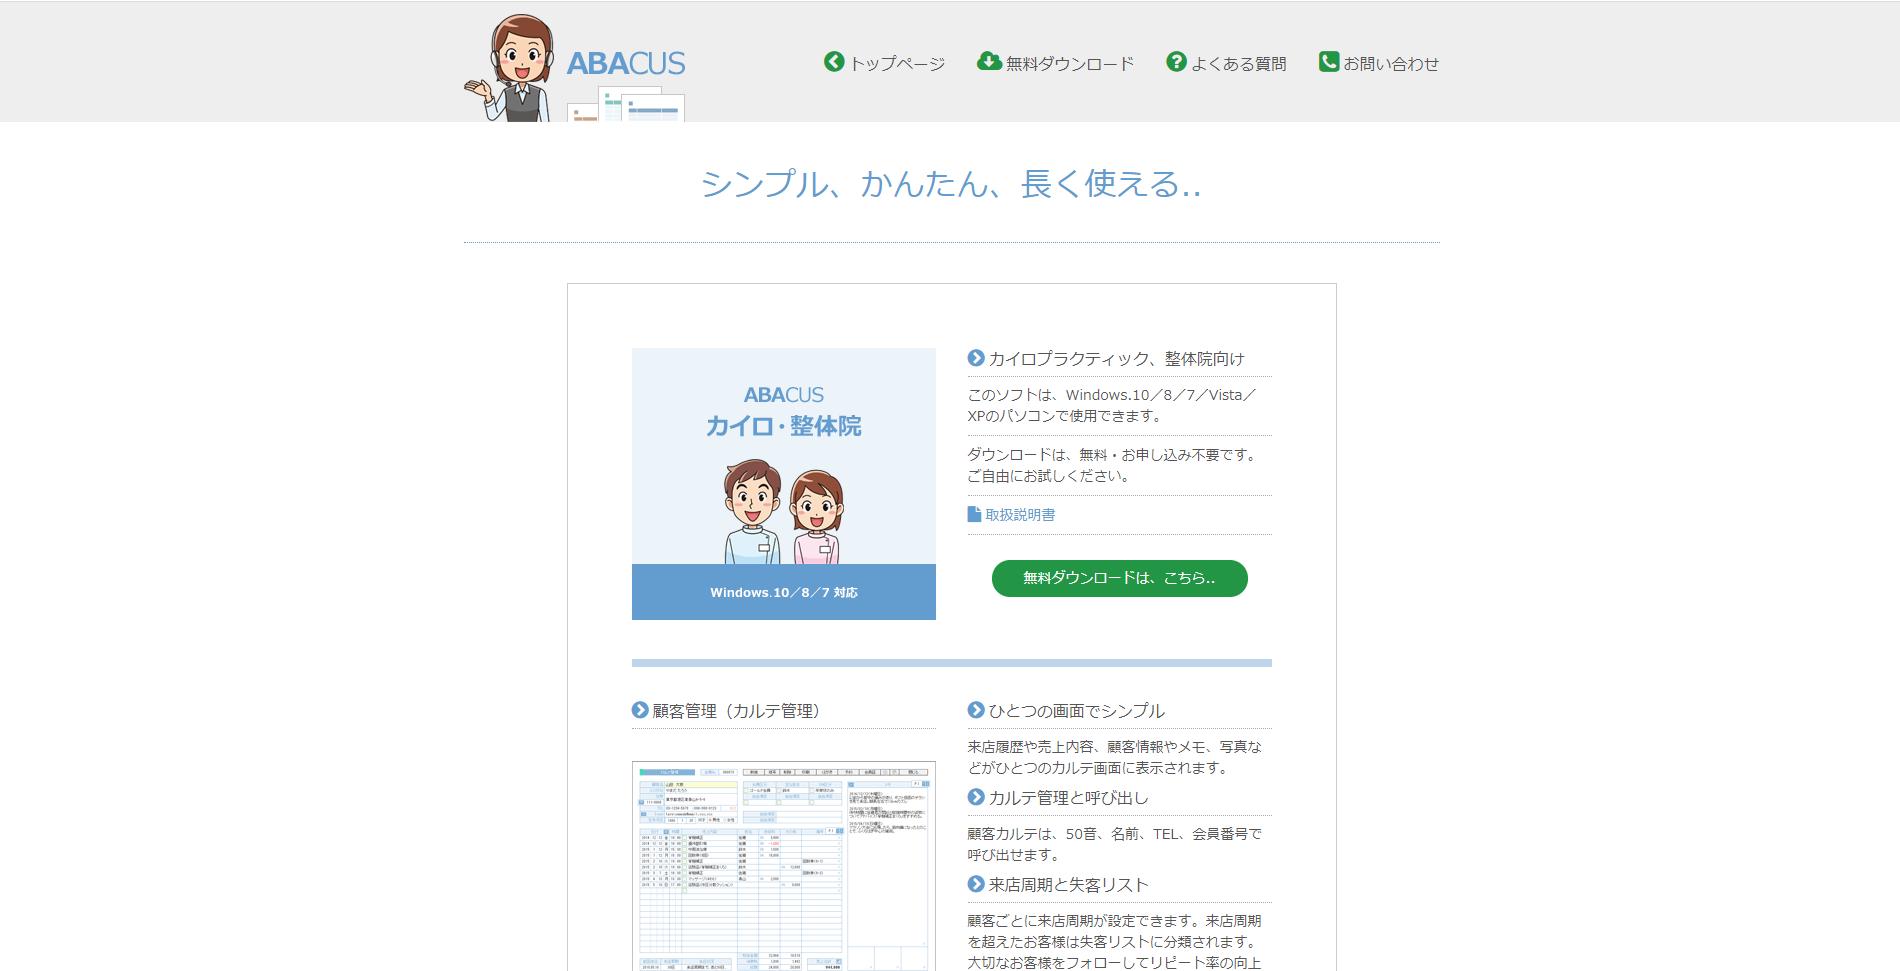 ABACUS カイロプラクティック・整体